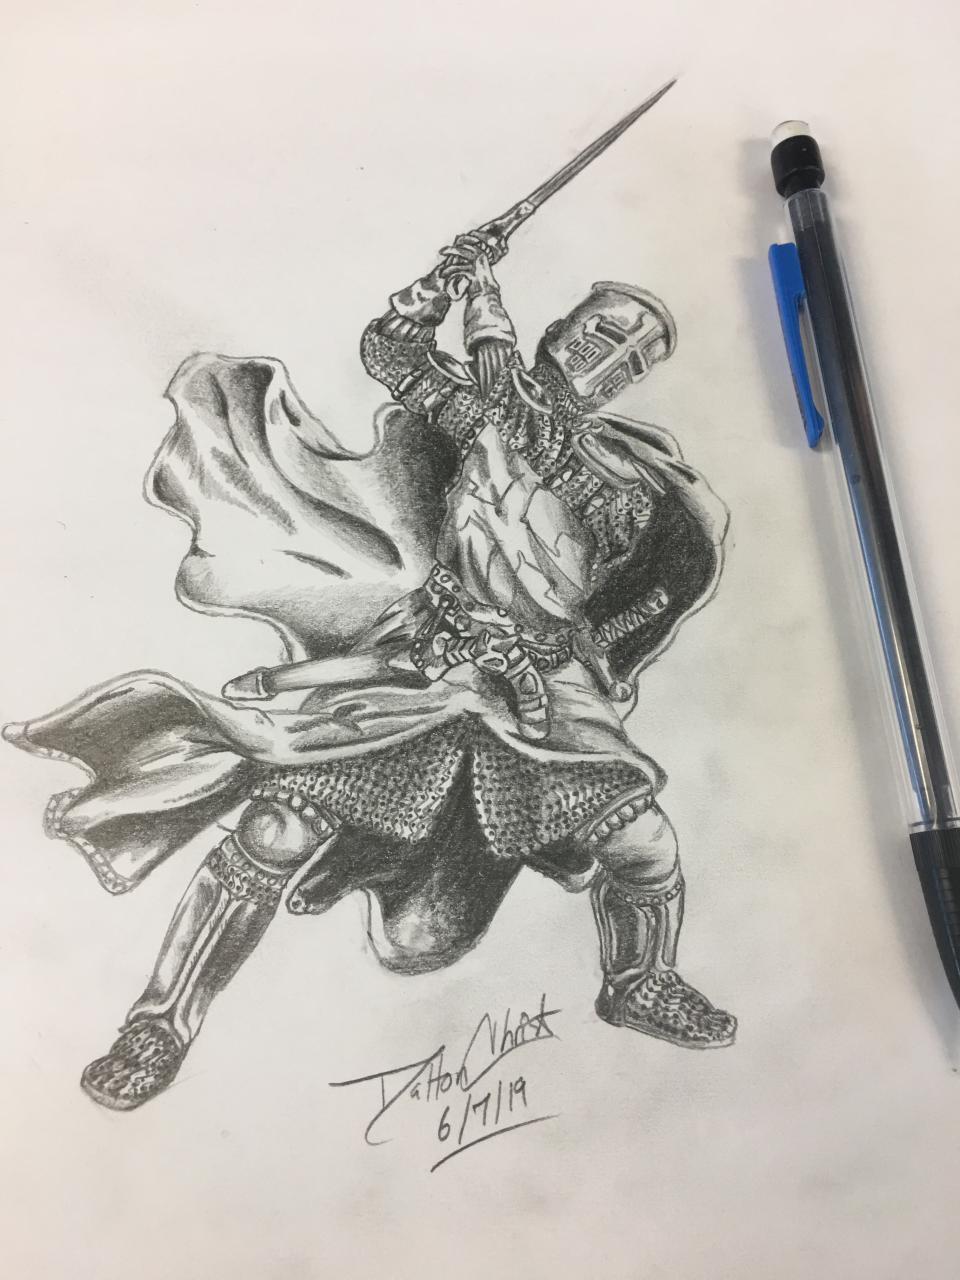 Most recent image: Templar